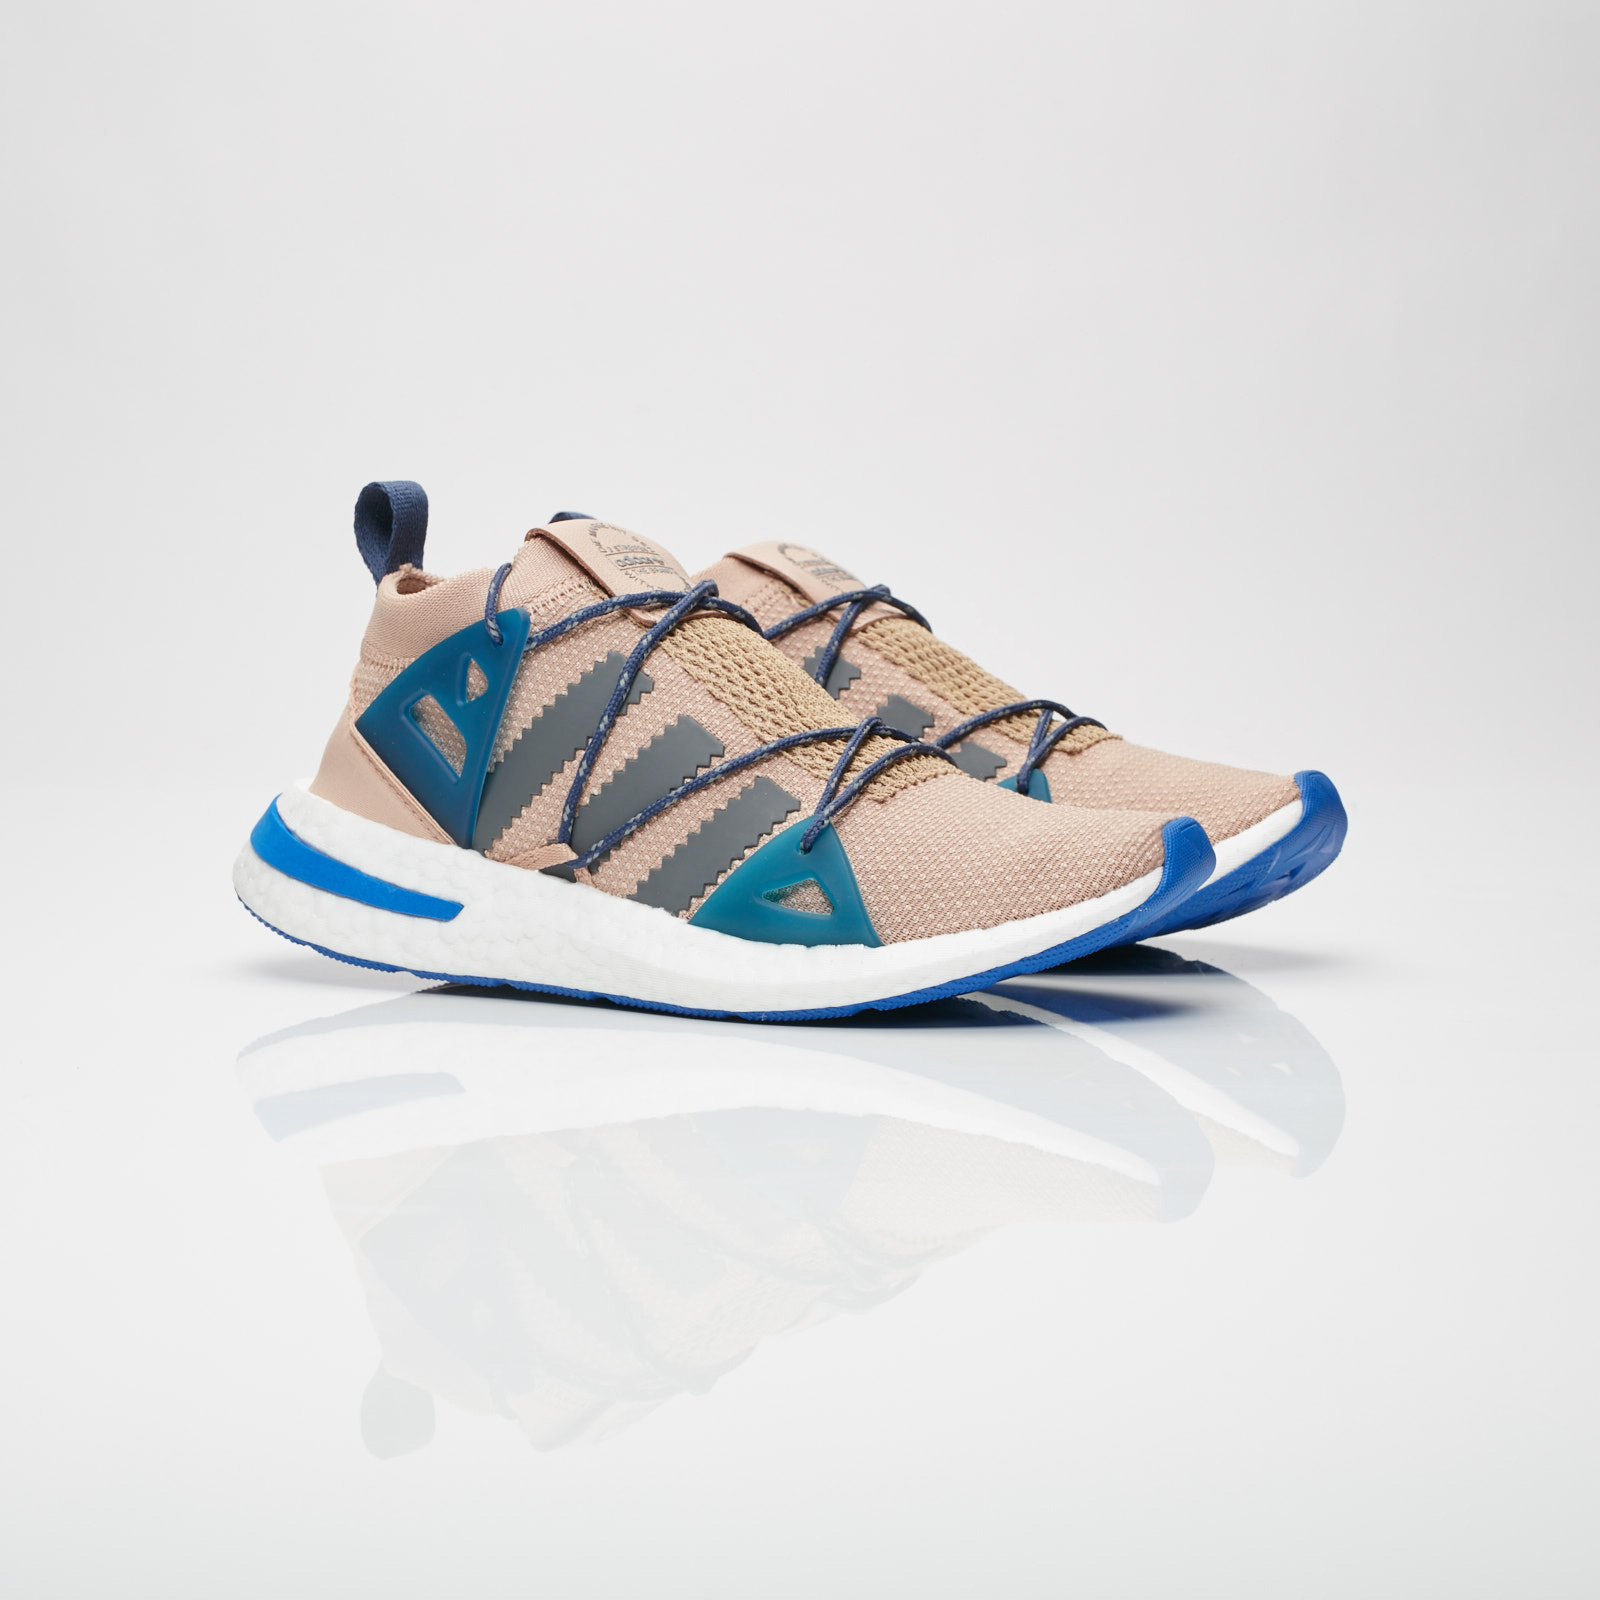 0a8e29f2d65b adidas Arkyn W - Da9604 - Sneakersnstuff